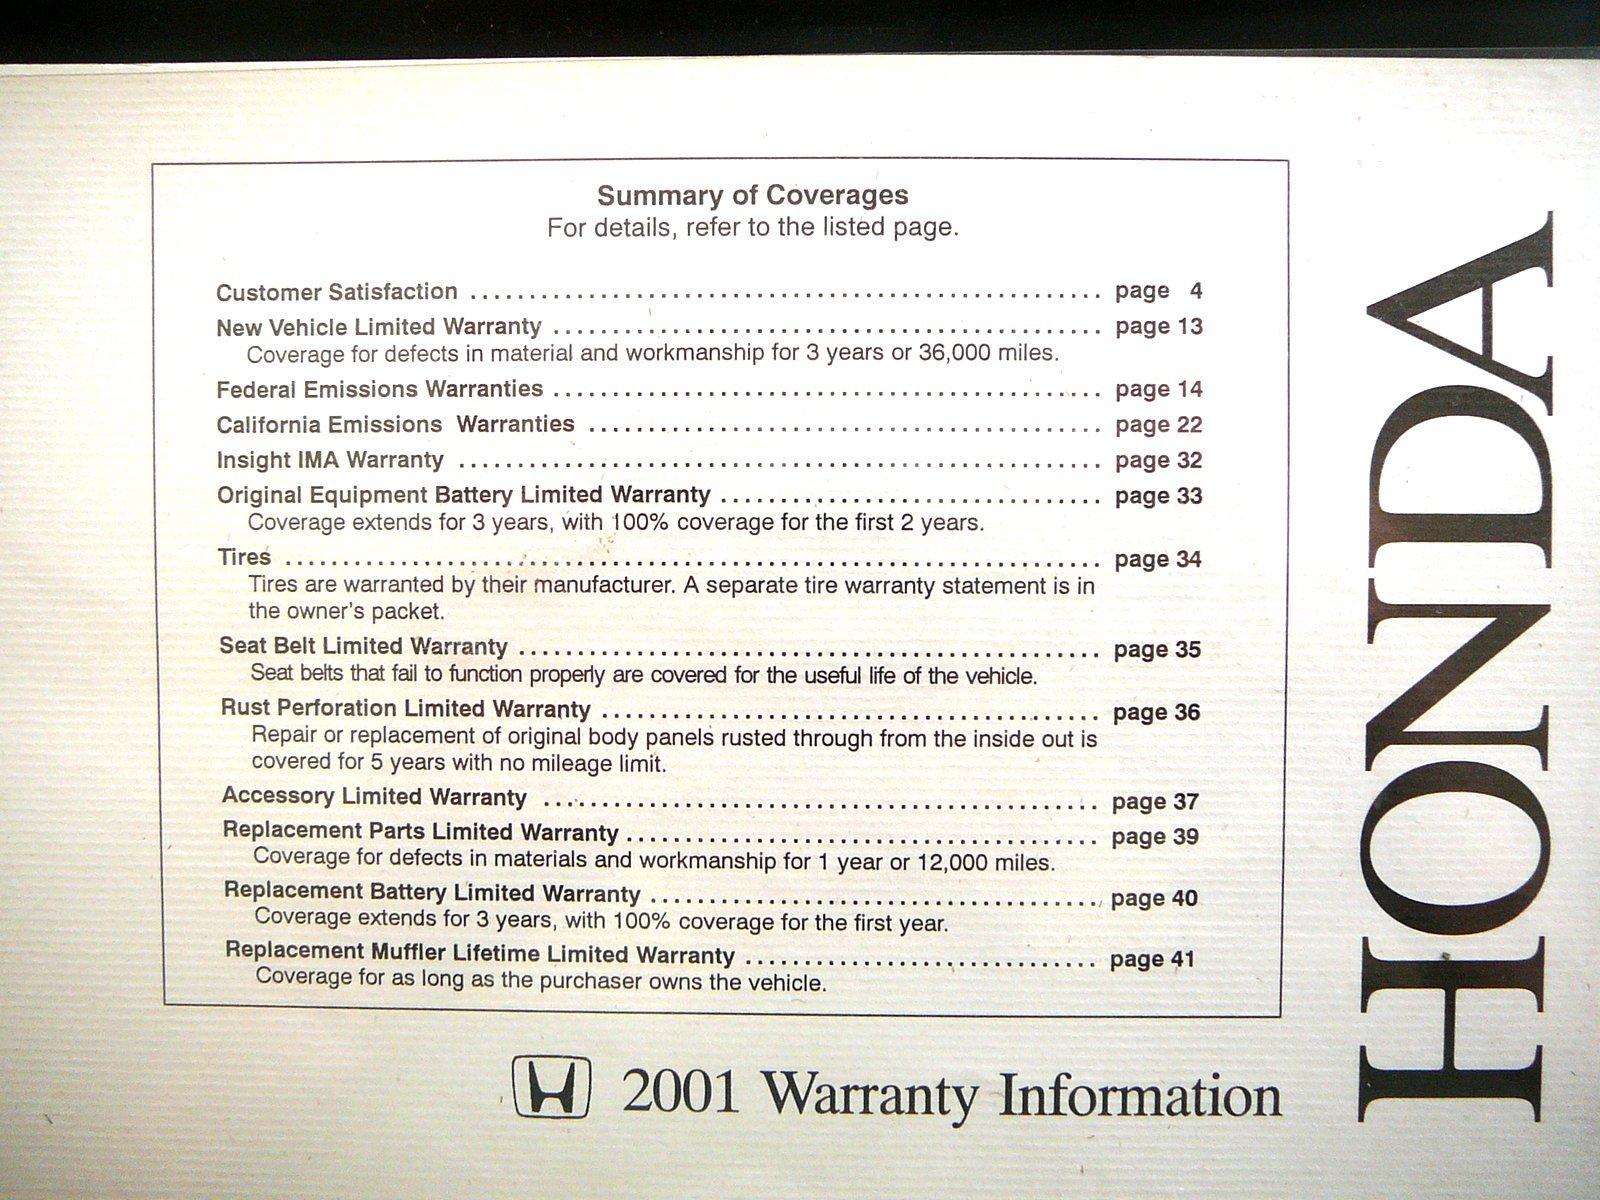 2001 owner s manual honda cr v honda amazon com books rh amazon com 2001 Honda CR-V Accessories honda cr v 2001 service manual pdf